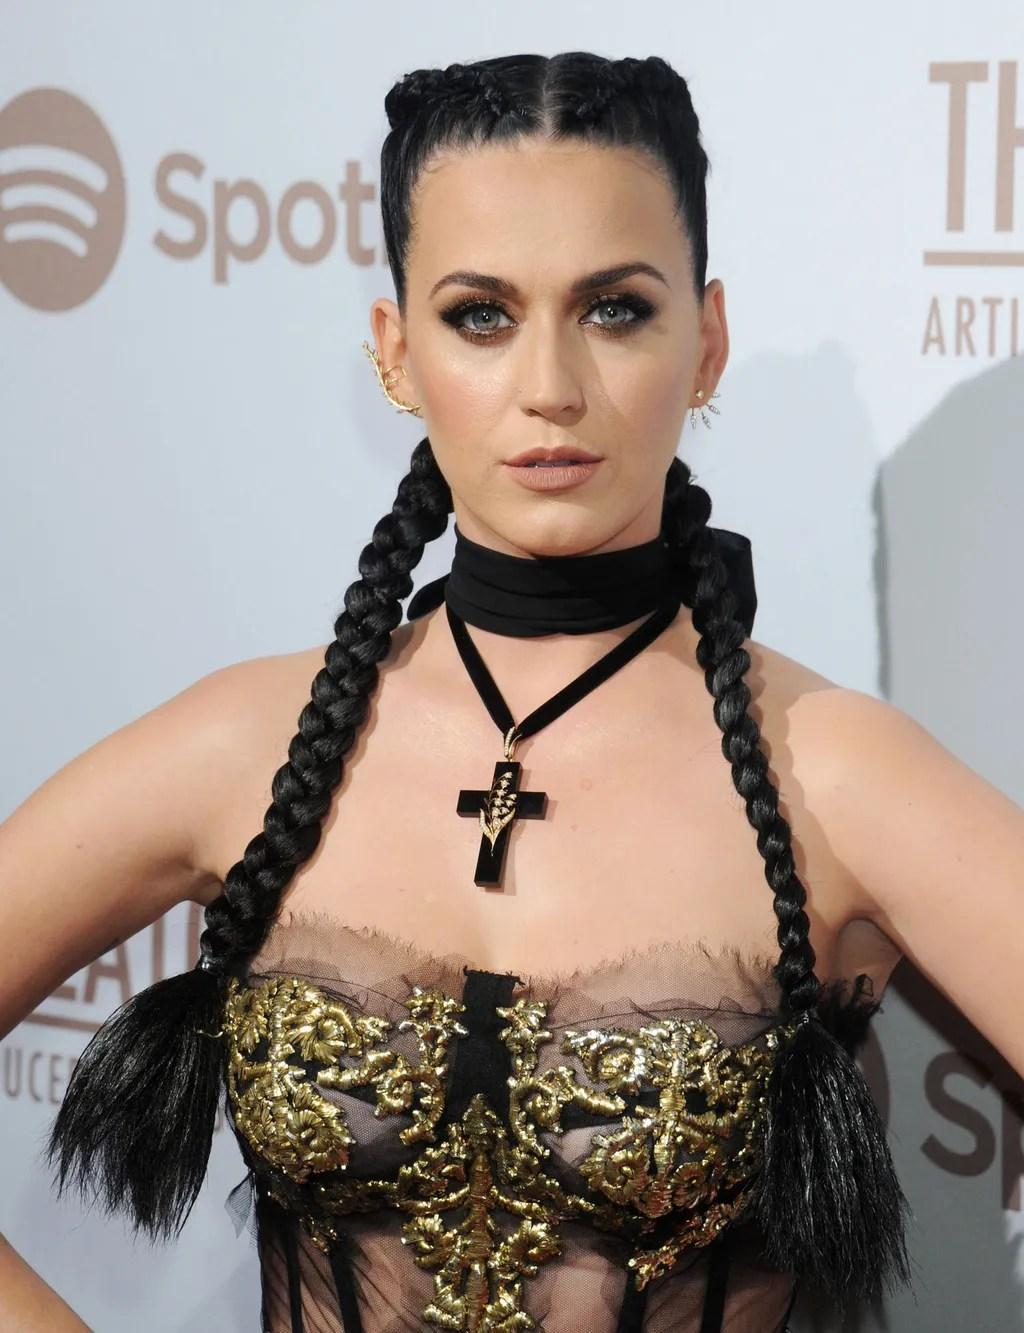 Hair Twins Katy Perry And Kim Kardashian Both Wear Boxer